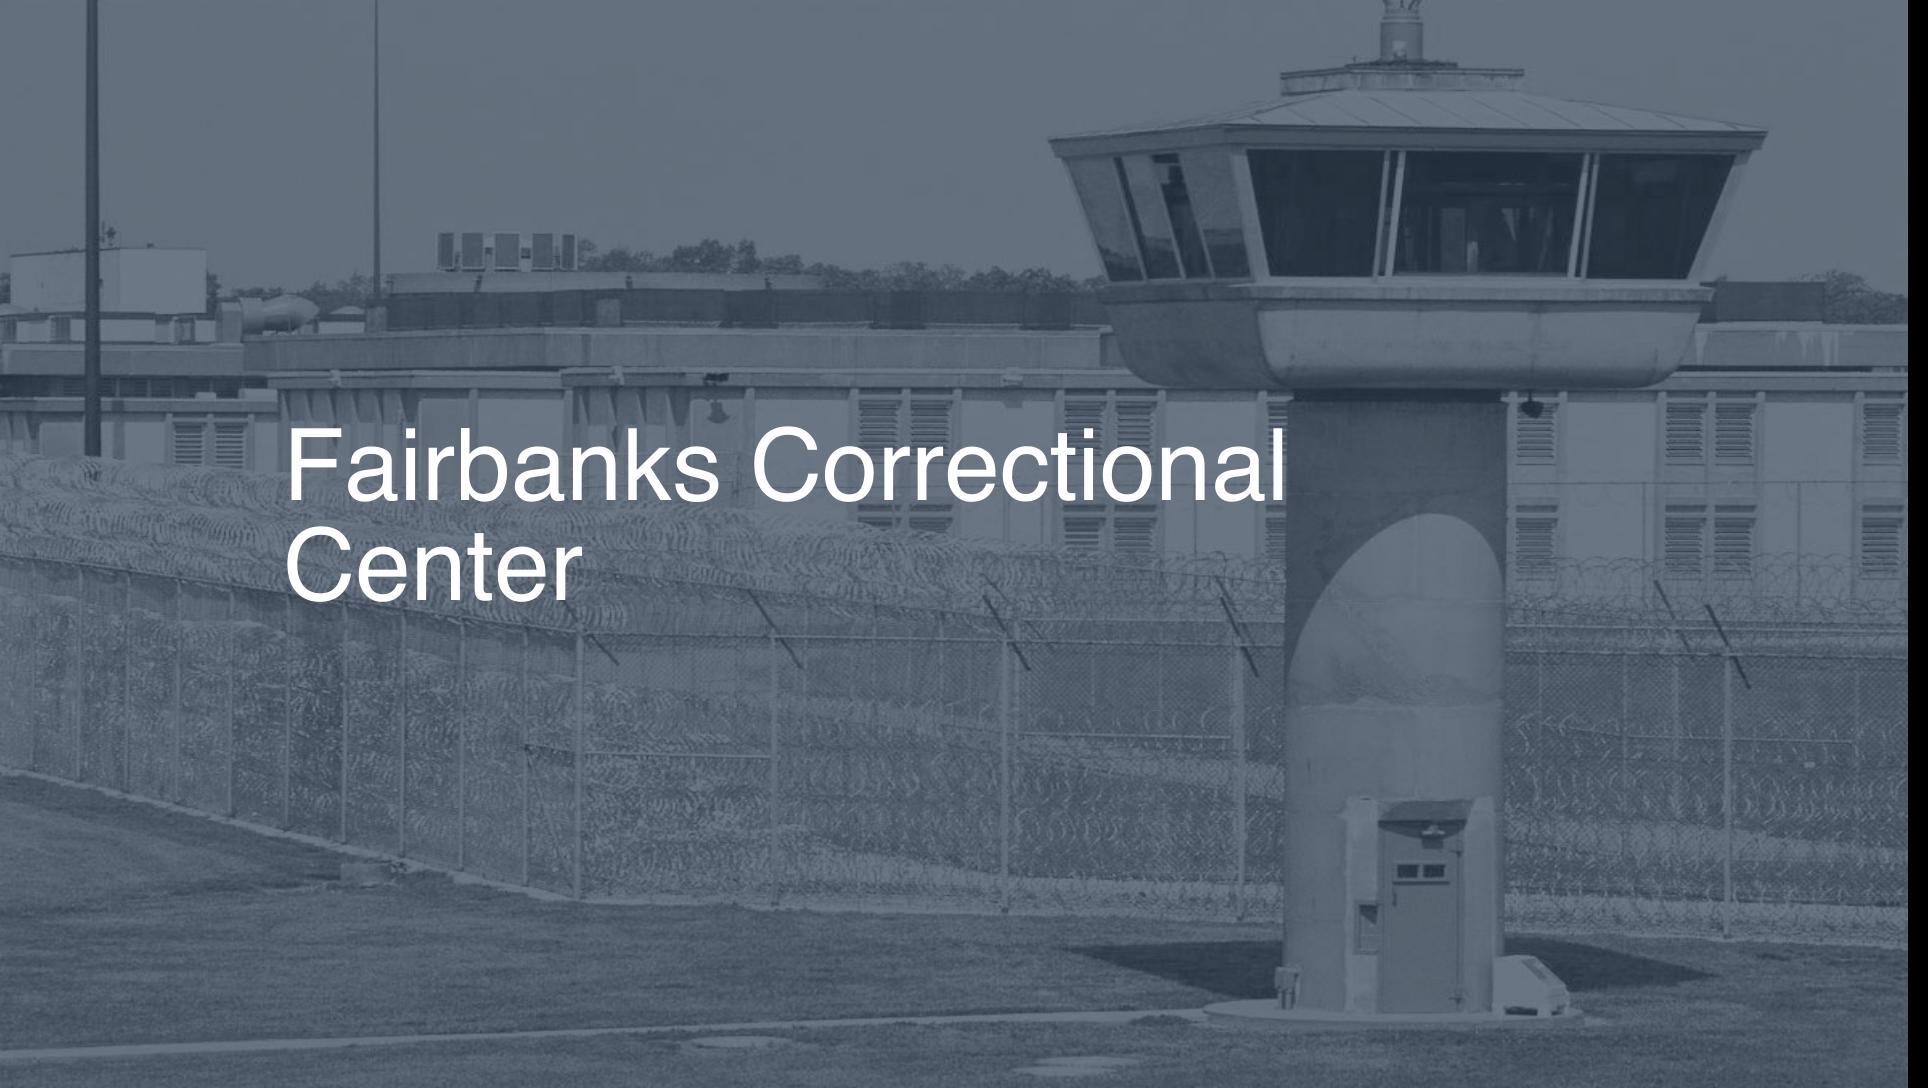 Fairbanks Correctional Center correctional facility picture